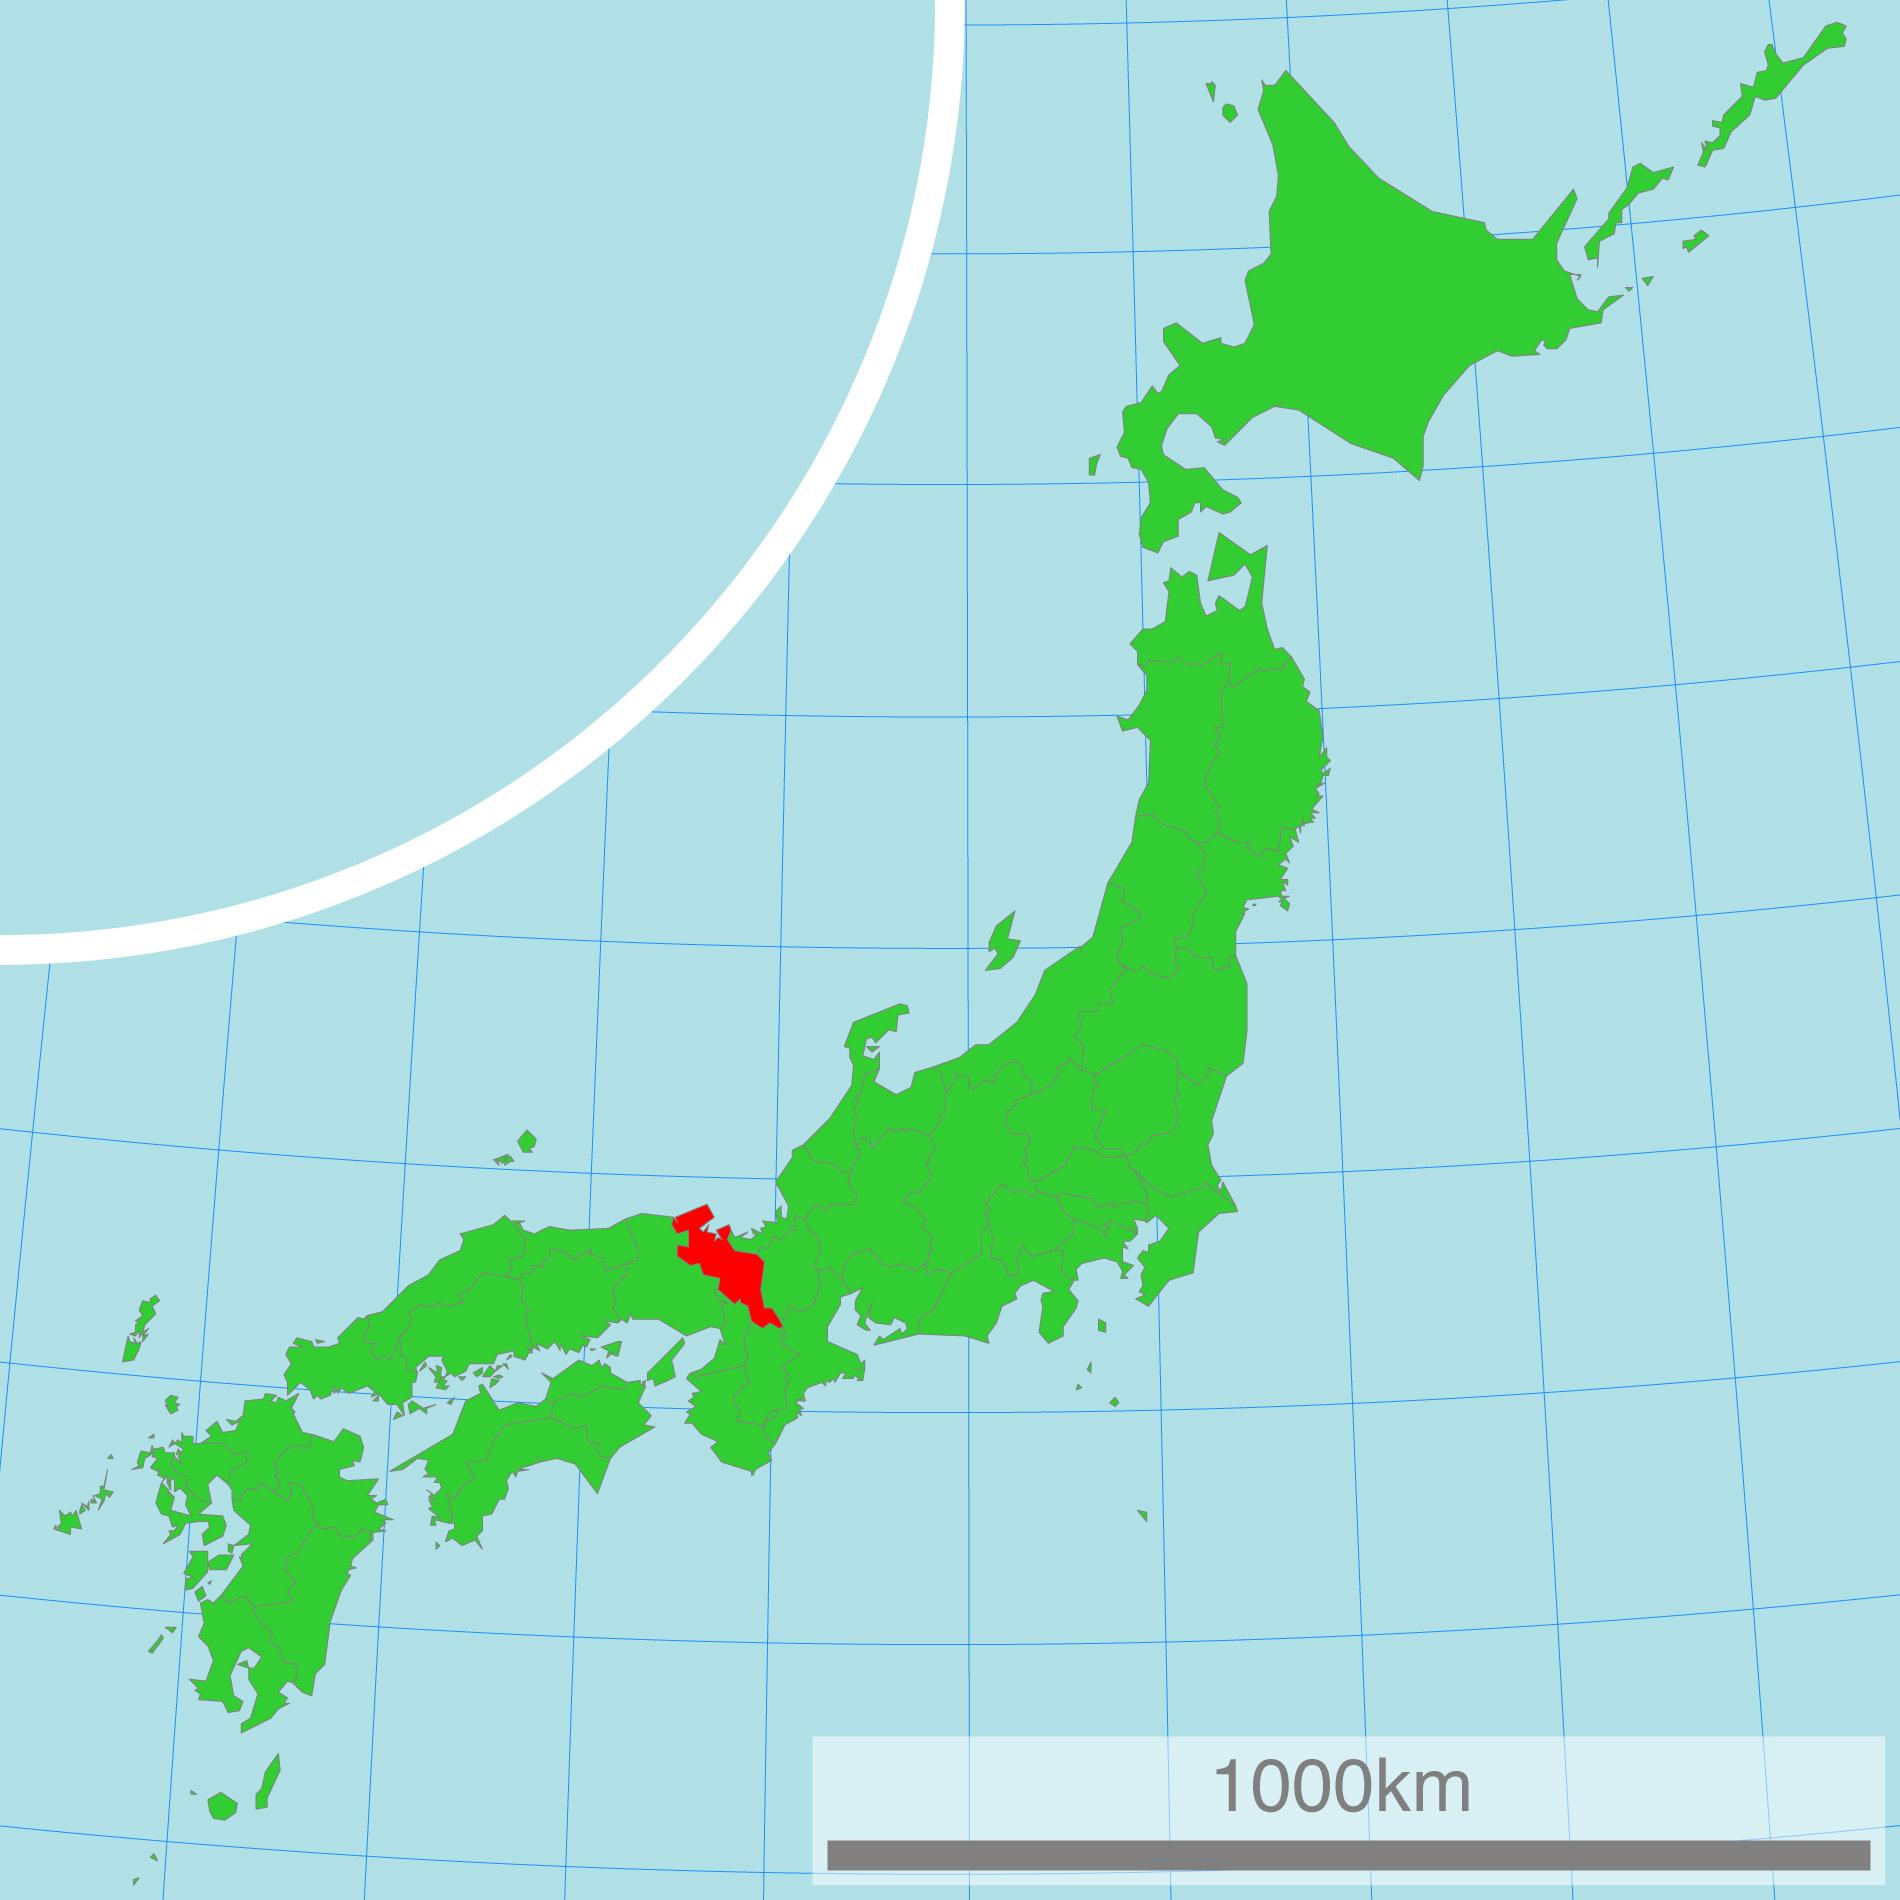 Japankarte: Die Präfektur Kyōto.